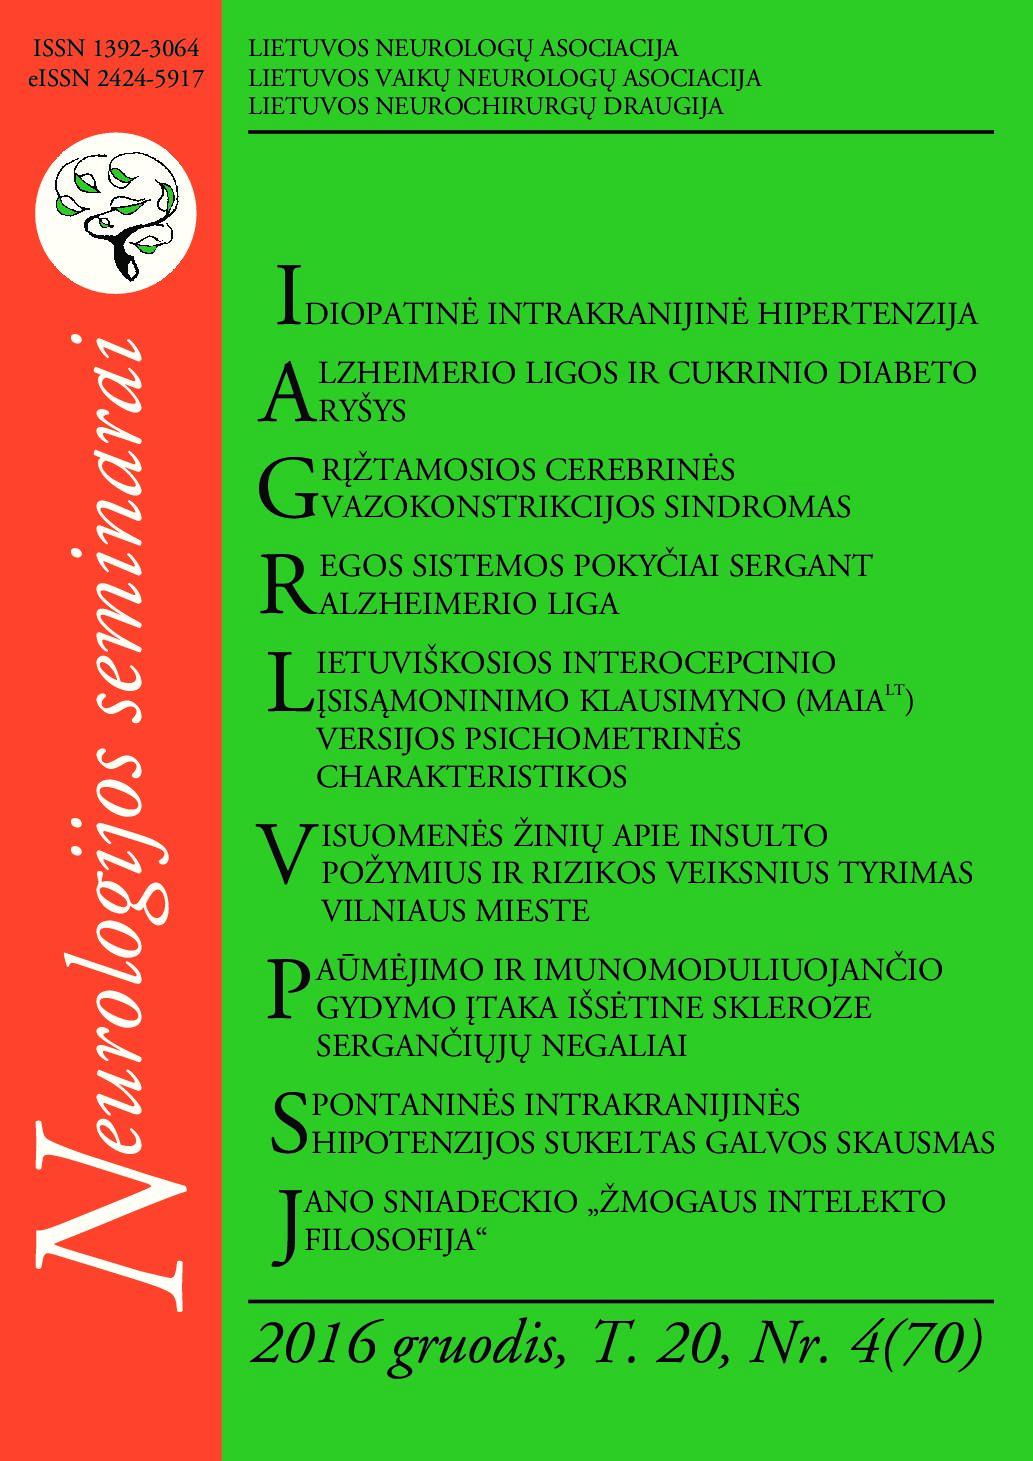 hipertenzija ir eritrocitozė